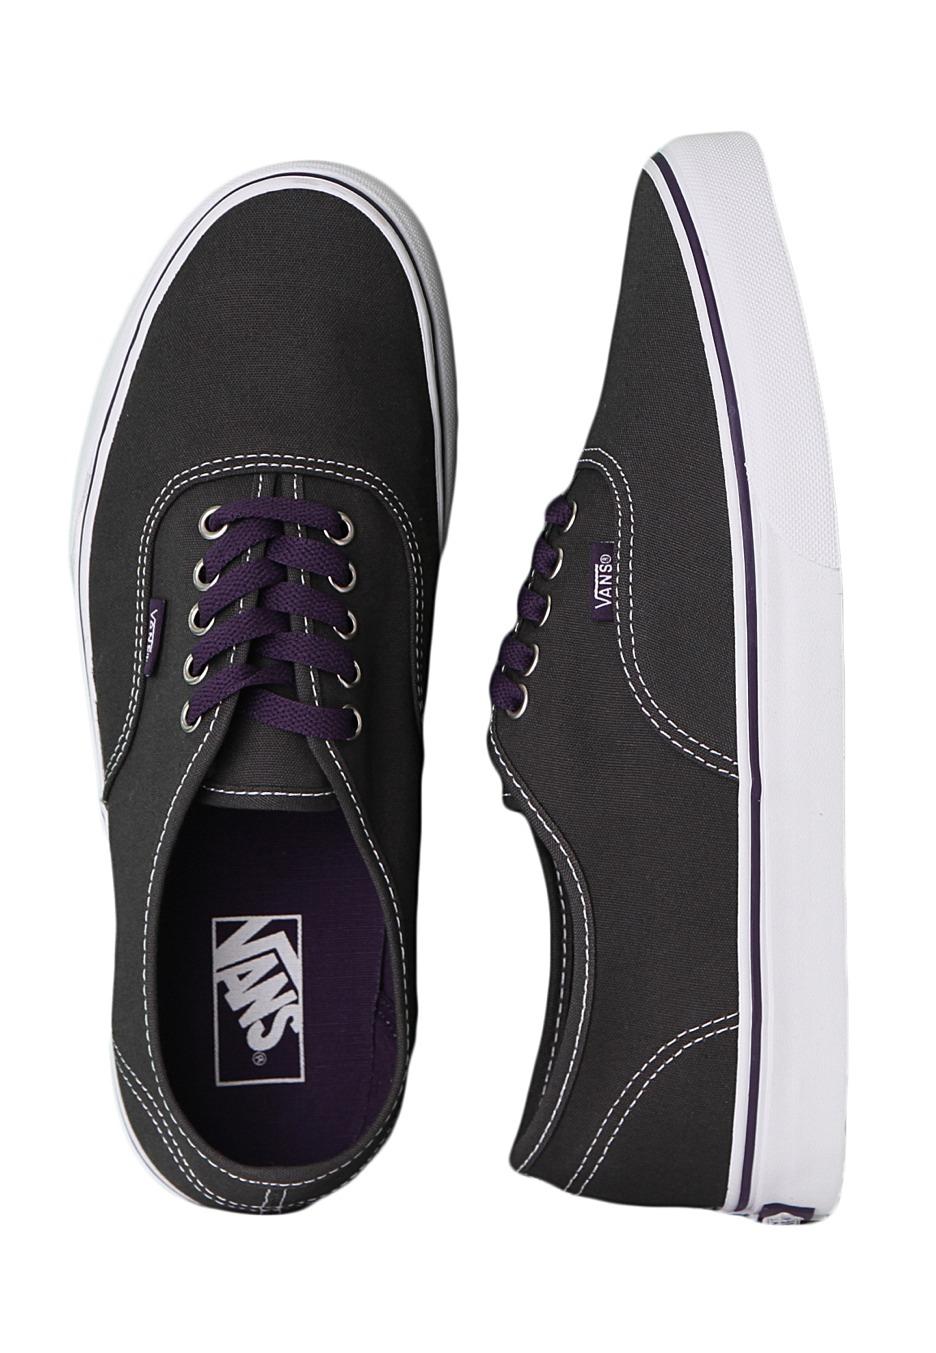 27a5c6c4ef Vans - Authentic Dark Shadow Gothic Grape - Shoes - Impericon.com UK